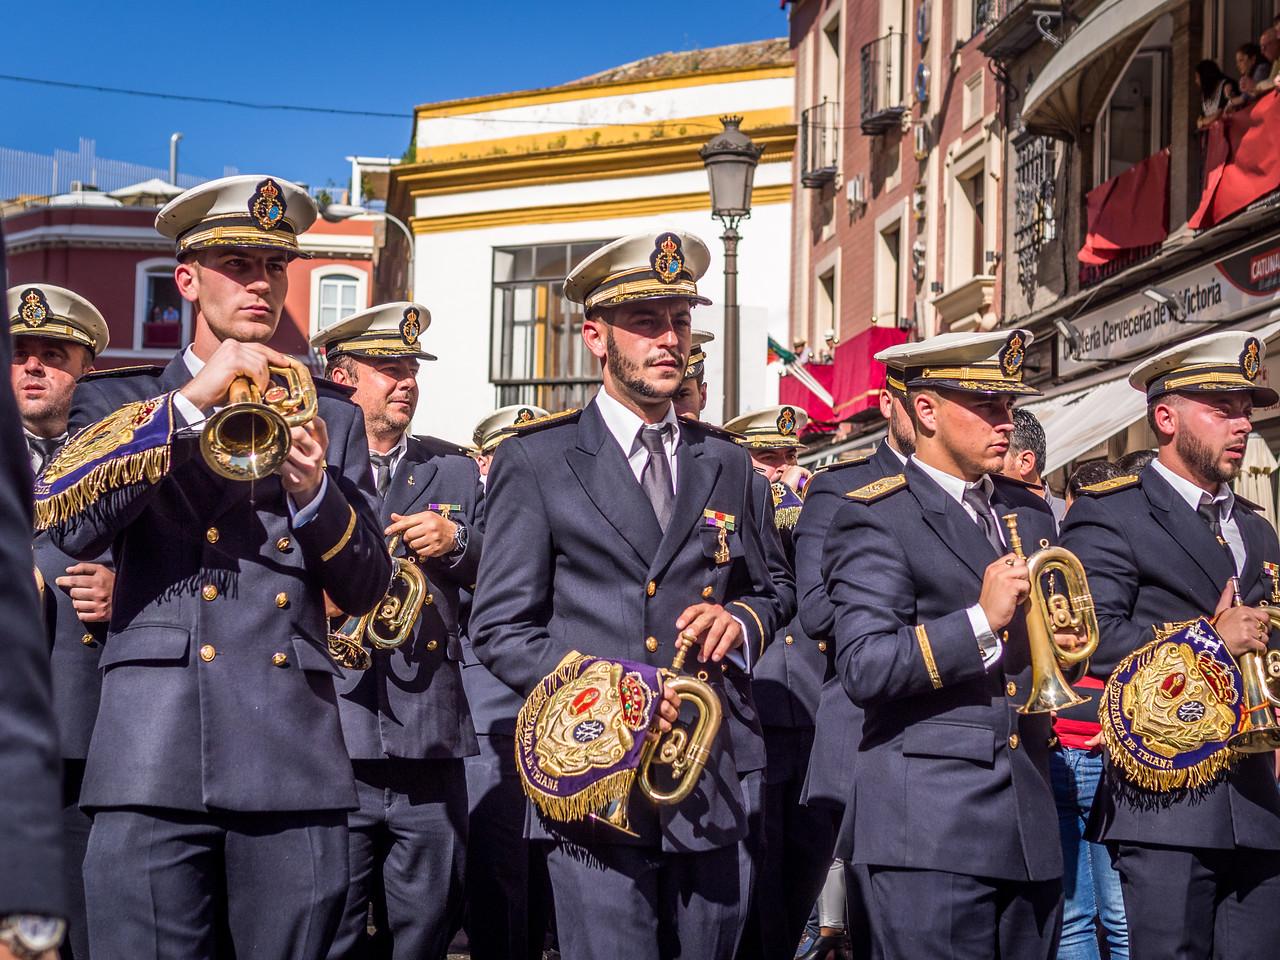 Trumpeters, Seville, Spain